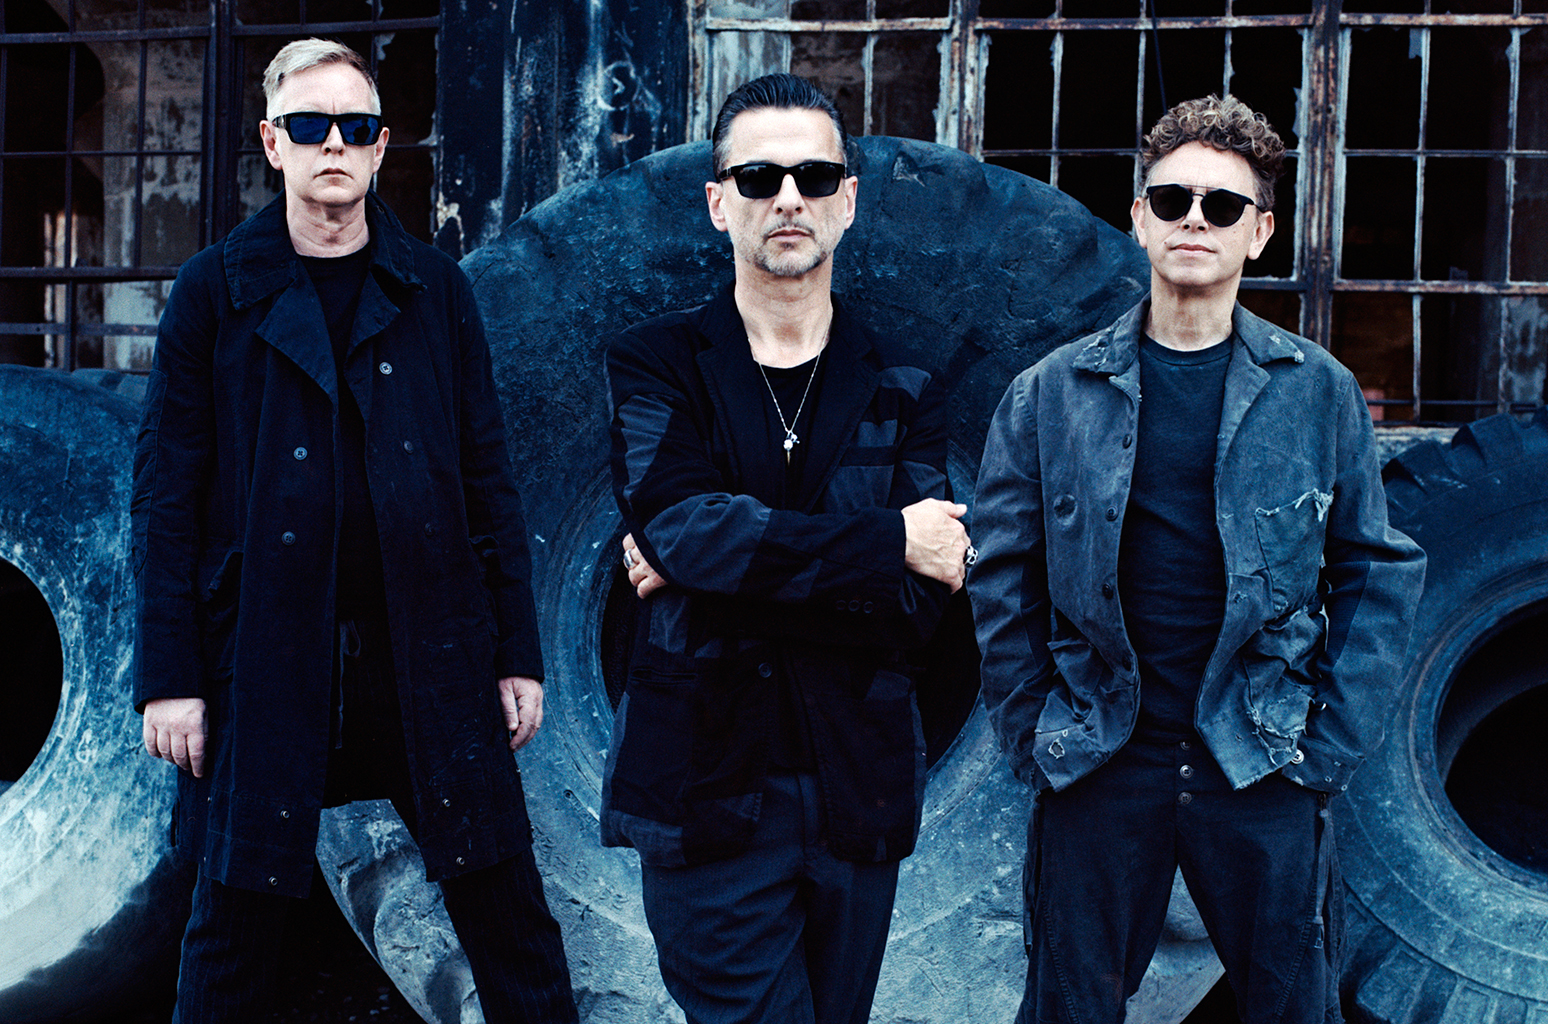 depeche-mode-press-photo-cr-anton-corbijn-2017-billboard-1548.jpg